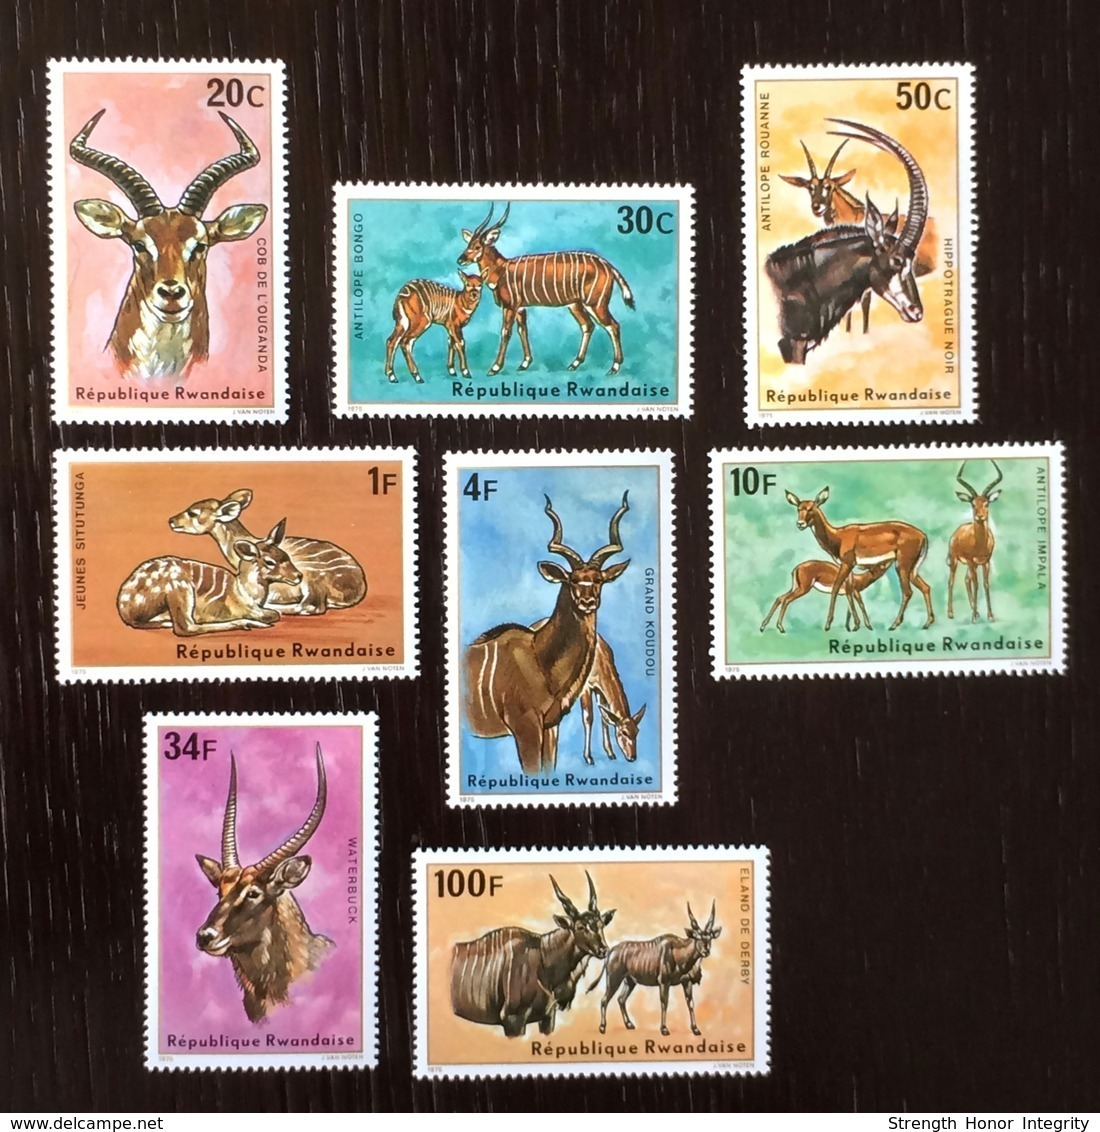 Rwanda 1975; Fauna Wild Animals; MNH / Neuf** / Postfrisch!! CV 18 Euro!! - Unclassified